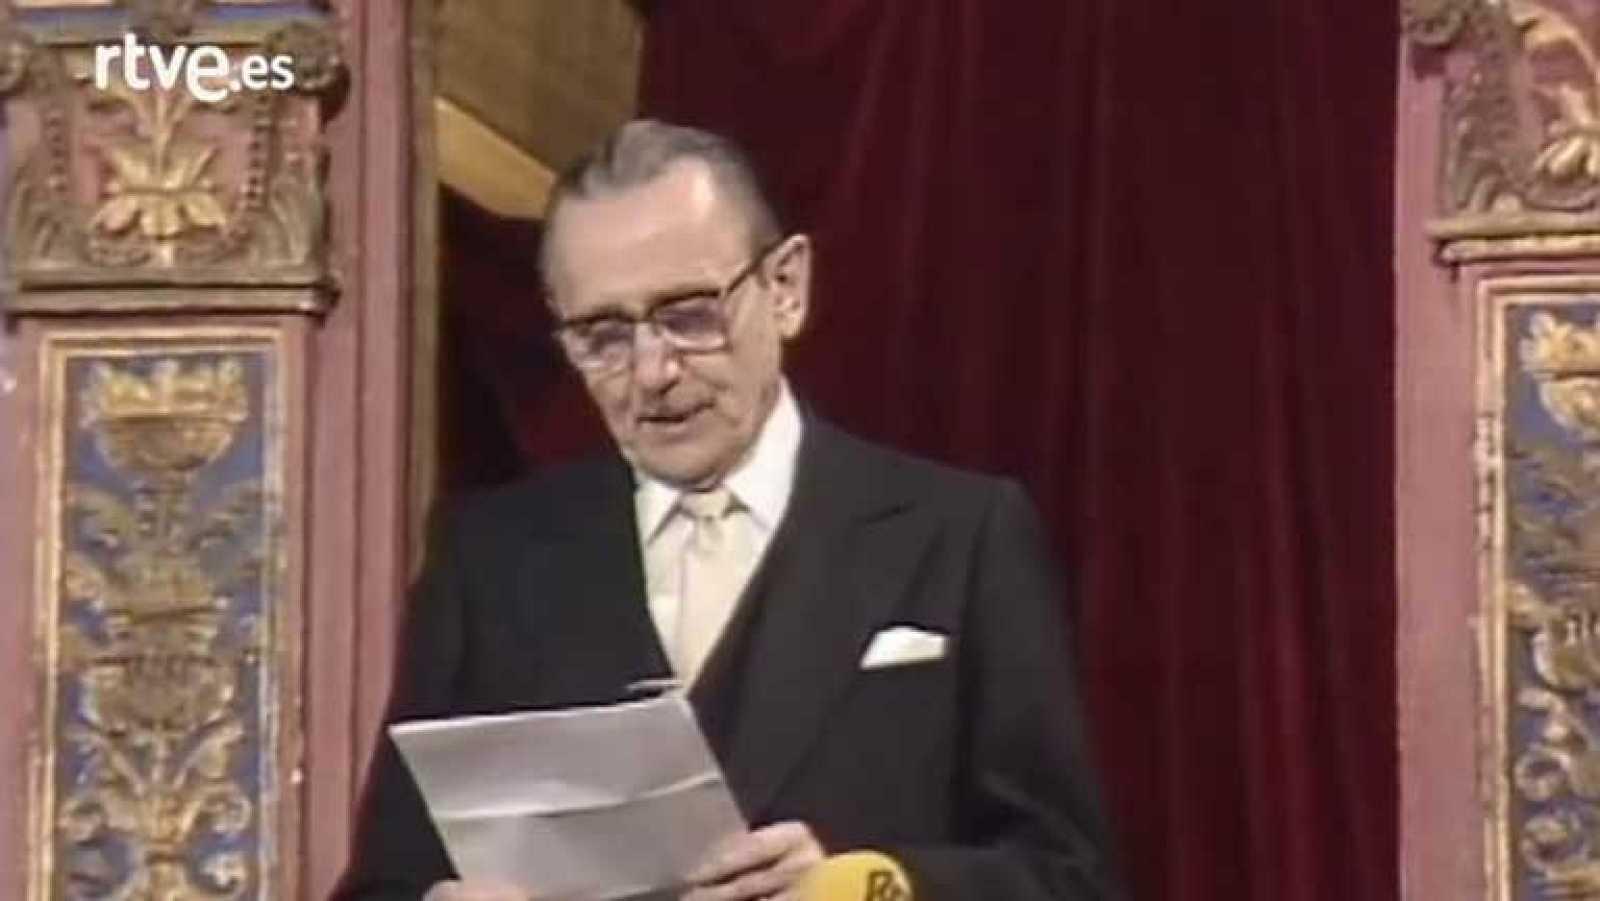 Discurso Antonio Buero Vallejo (Premio Cervantes 1986)